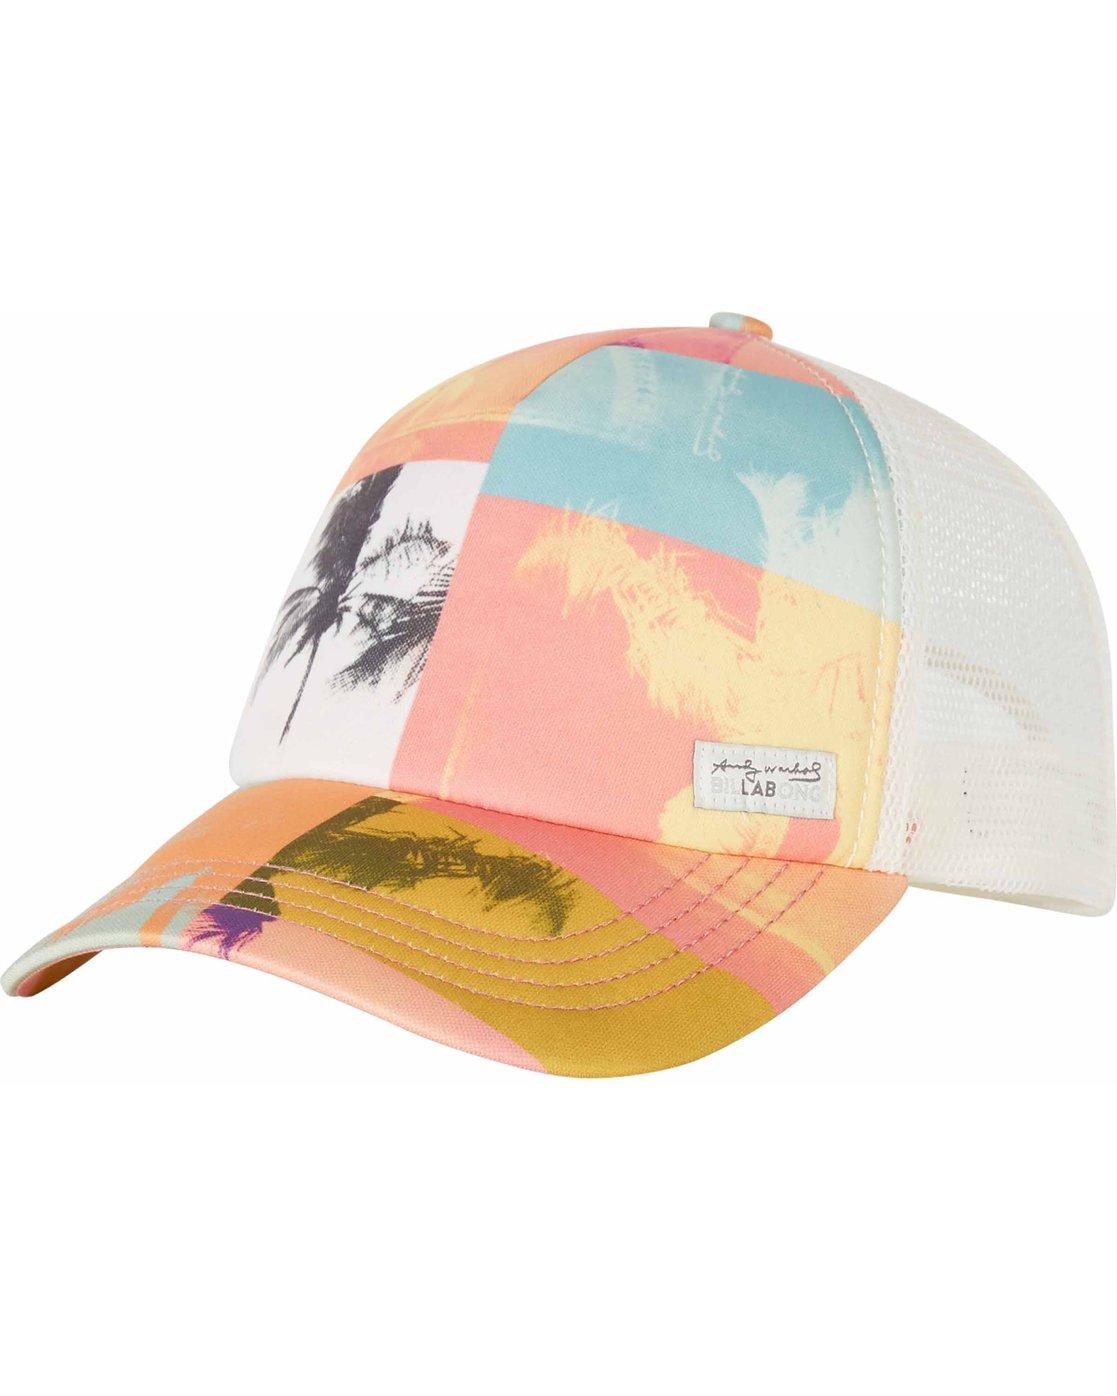 eb9b4ccefd05e4 0 Warholsurf Warhol Trucker Hat JAHTLWAR Billabong